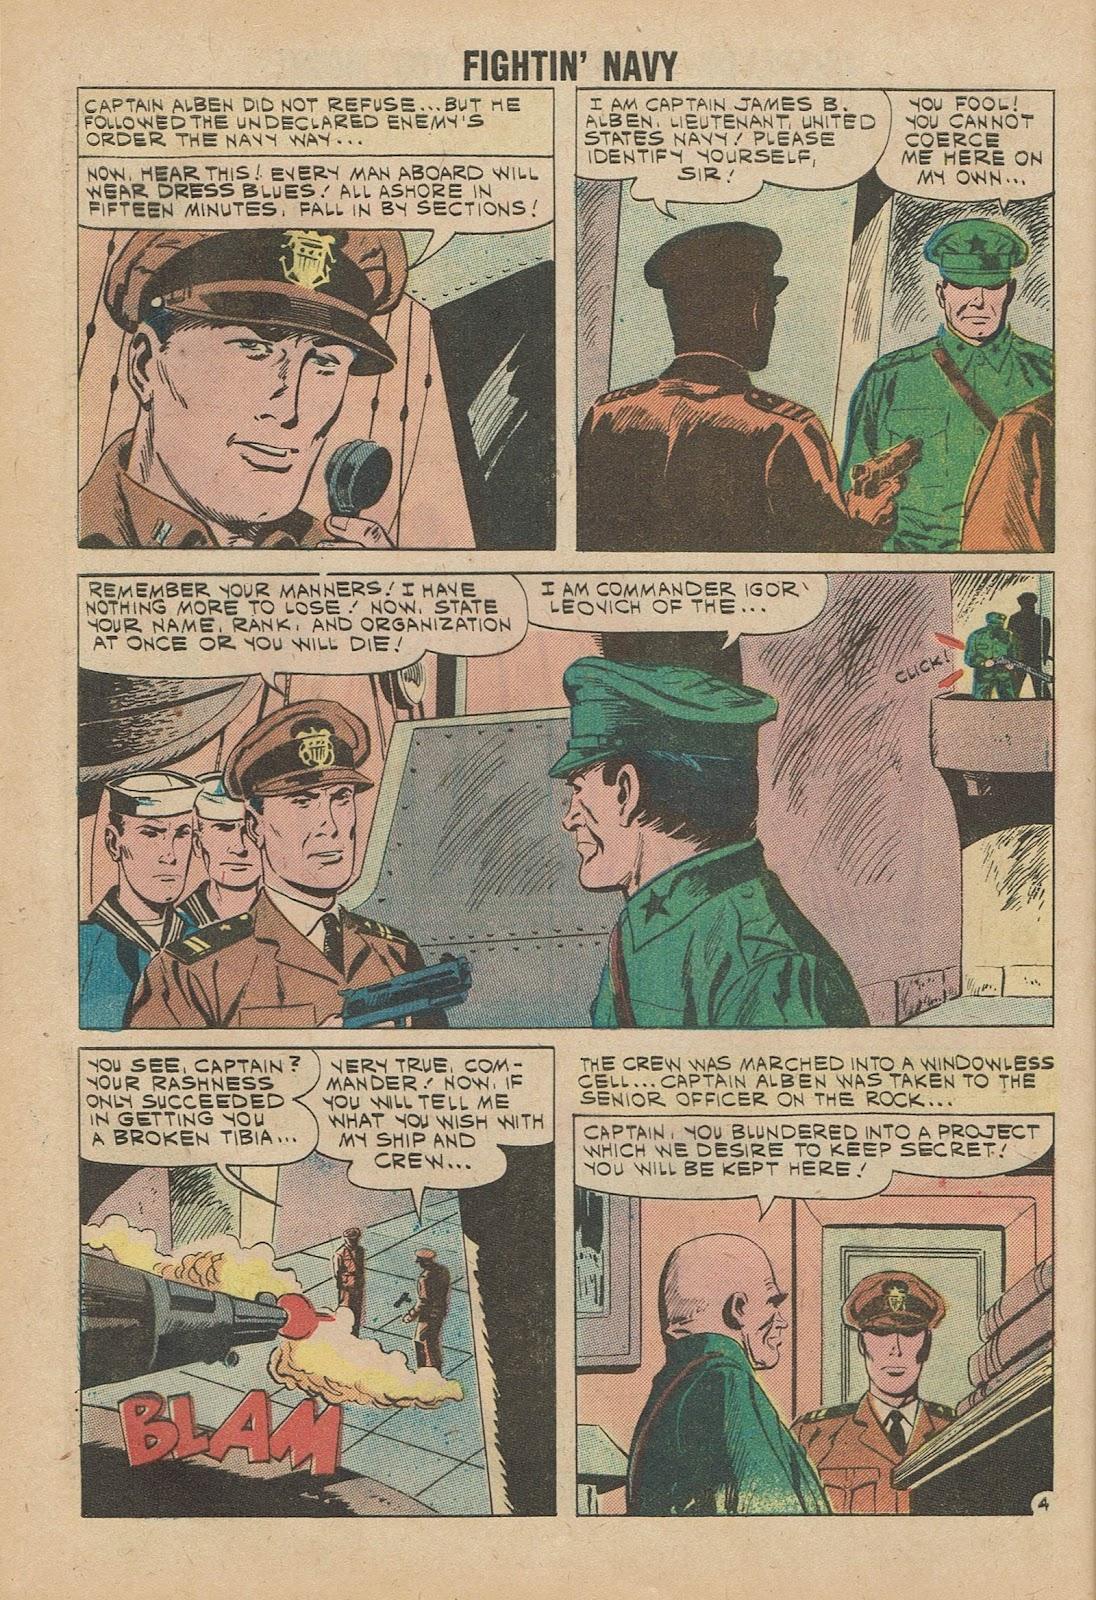 Read online Fightin' Navy comic -  Issue #98 - 28